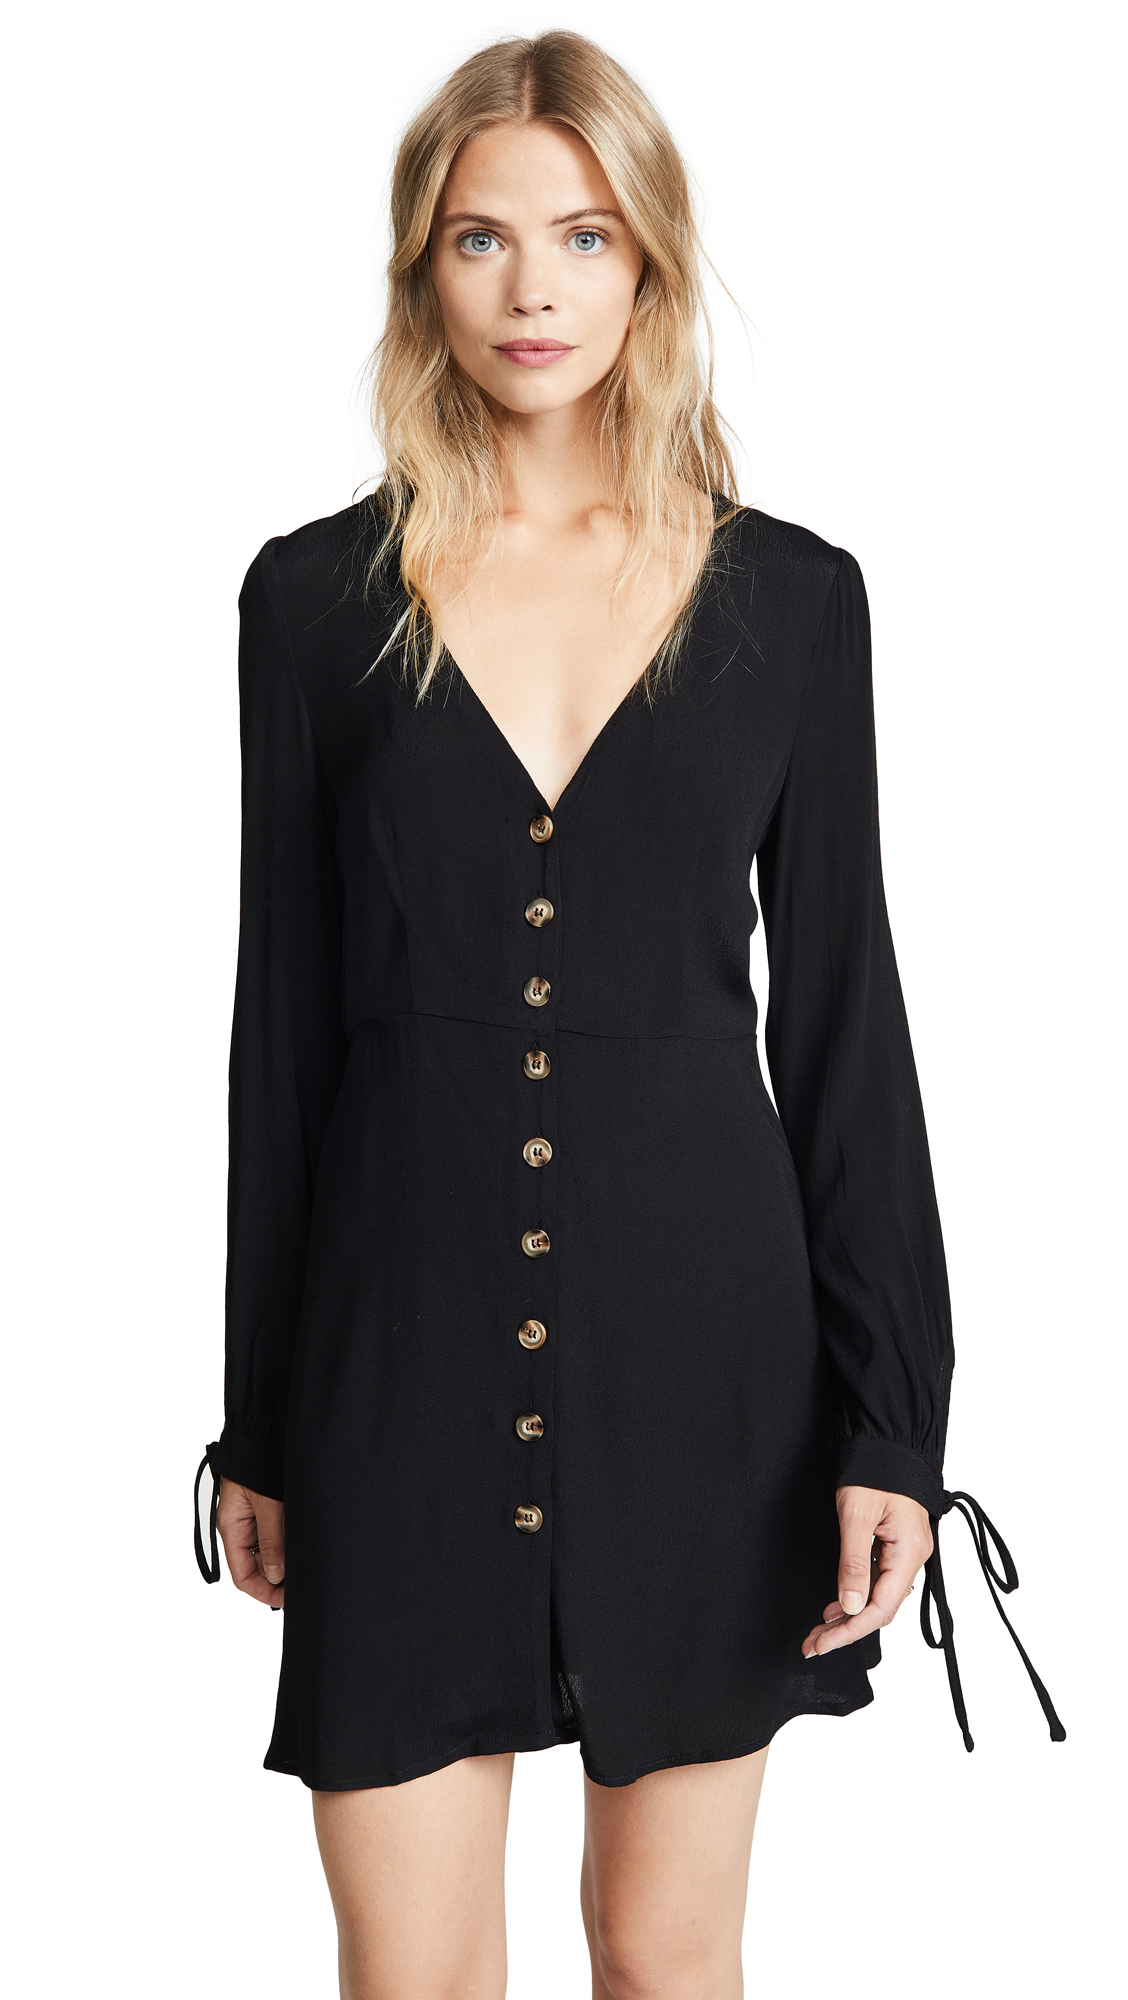 RE:NAMED Re: Named Babi Dress in Black